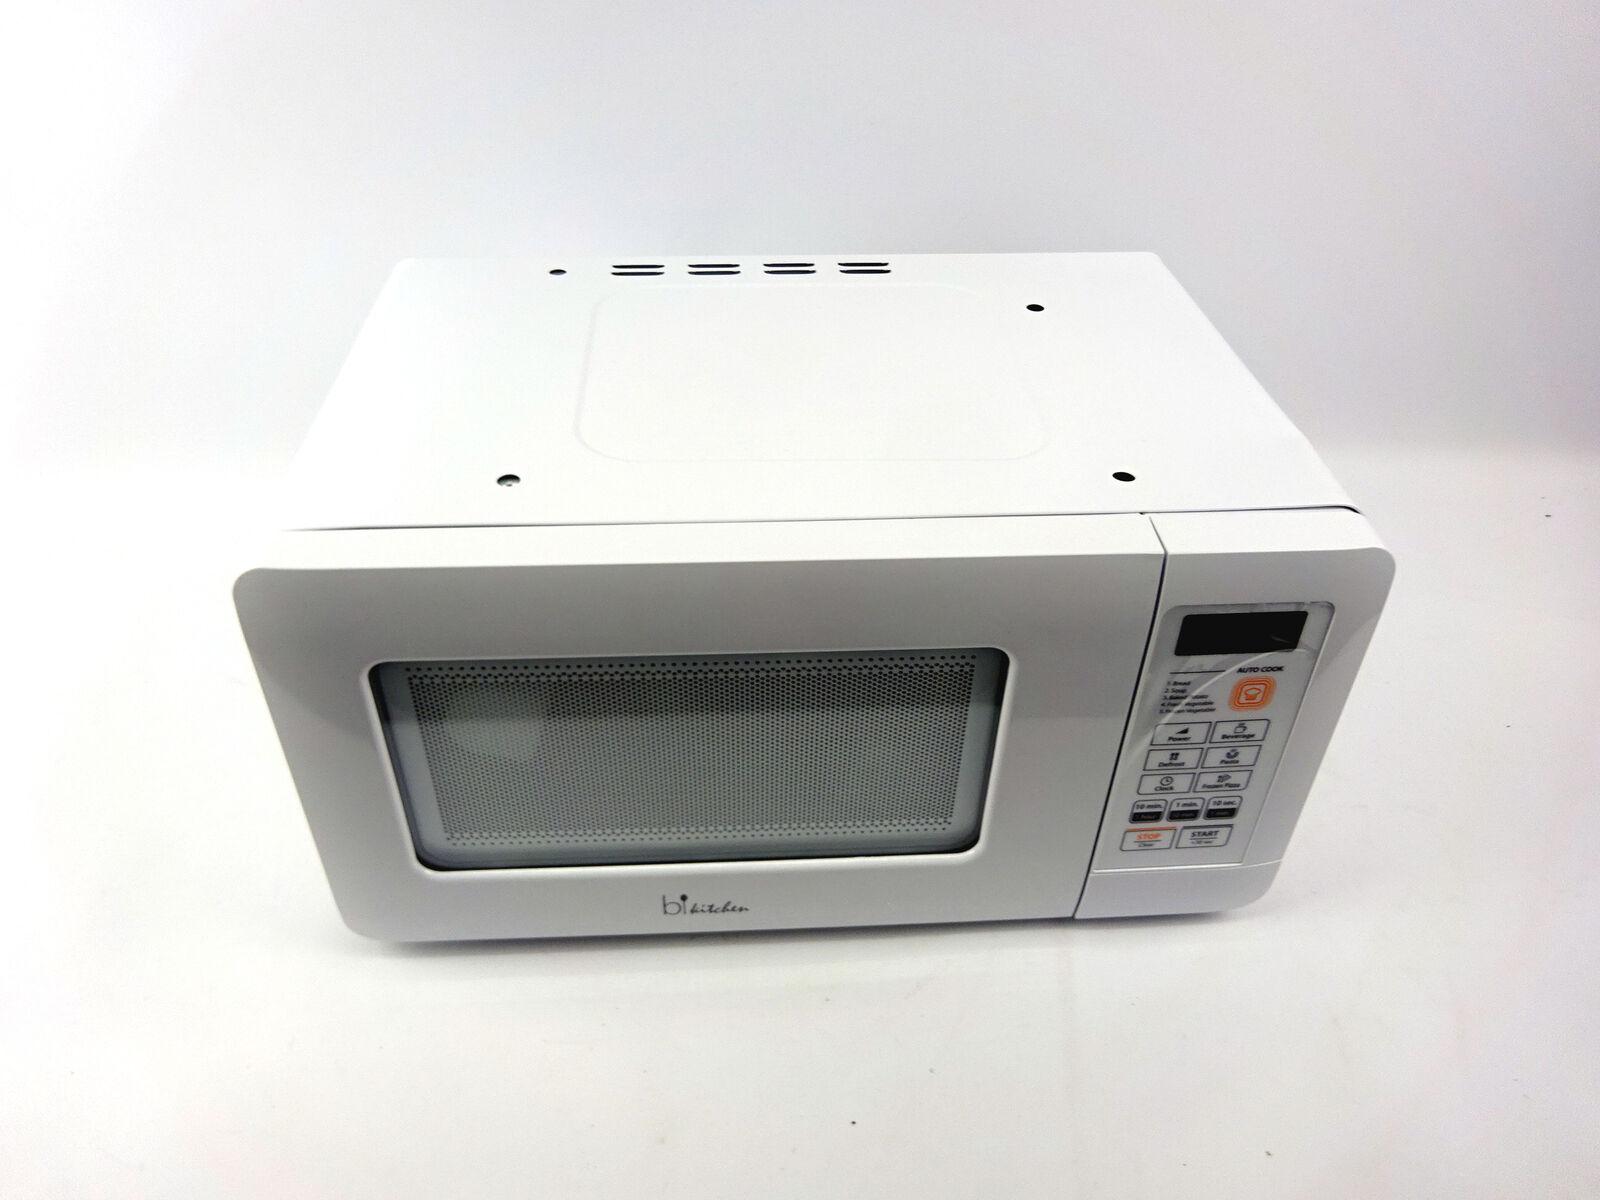 BKITCHEN Mini 200 Kompakt-Mikrowelle mit Auftau- und Diamond DEFEKT W21-JV9741